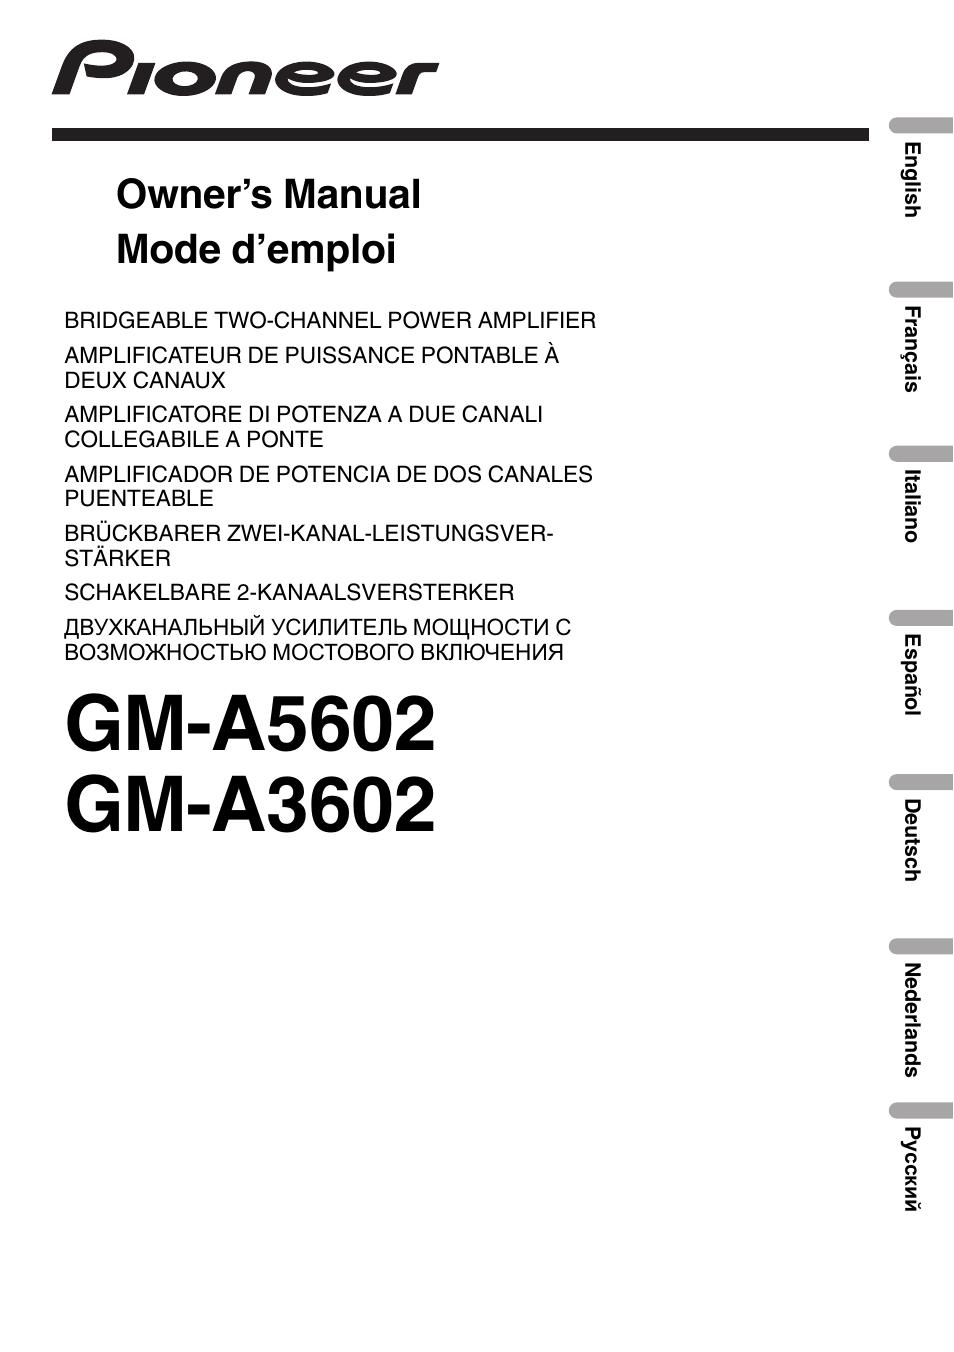 Pioneer gm-a5602 manuals.